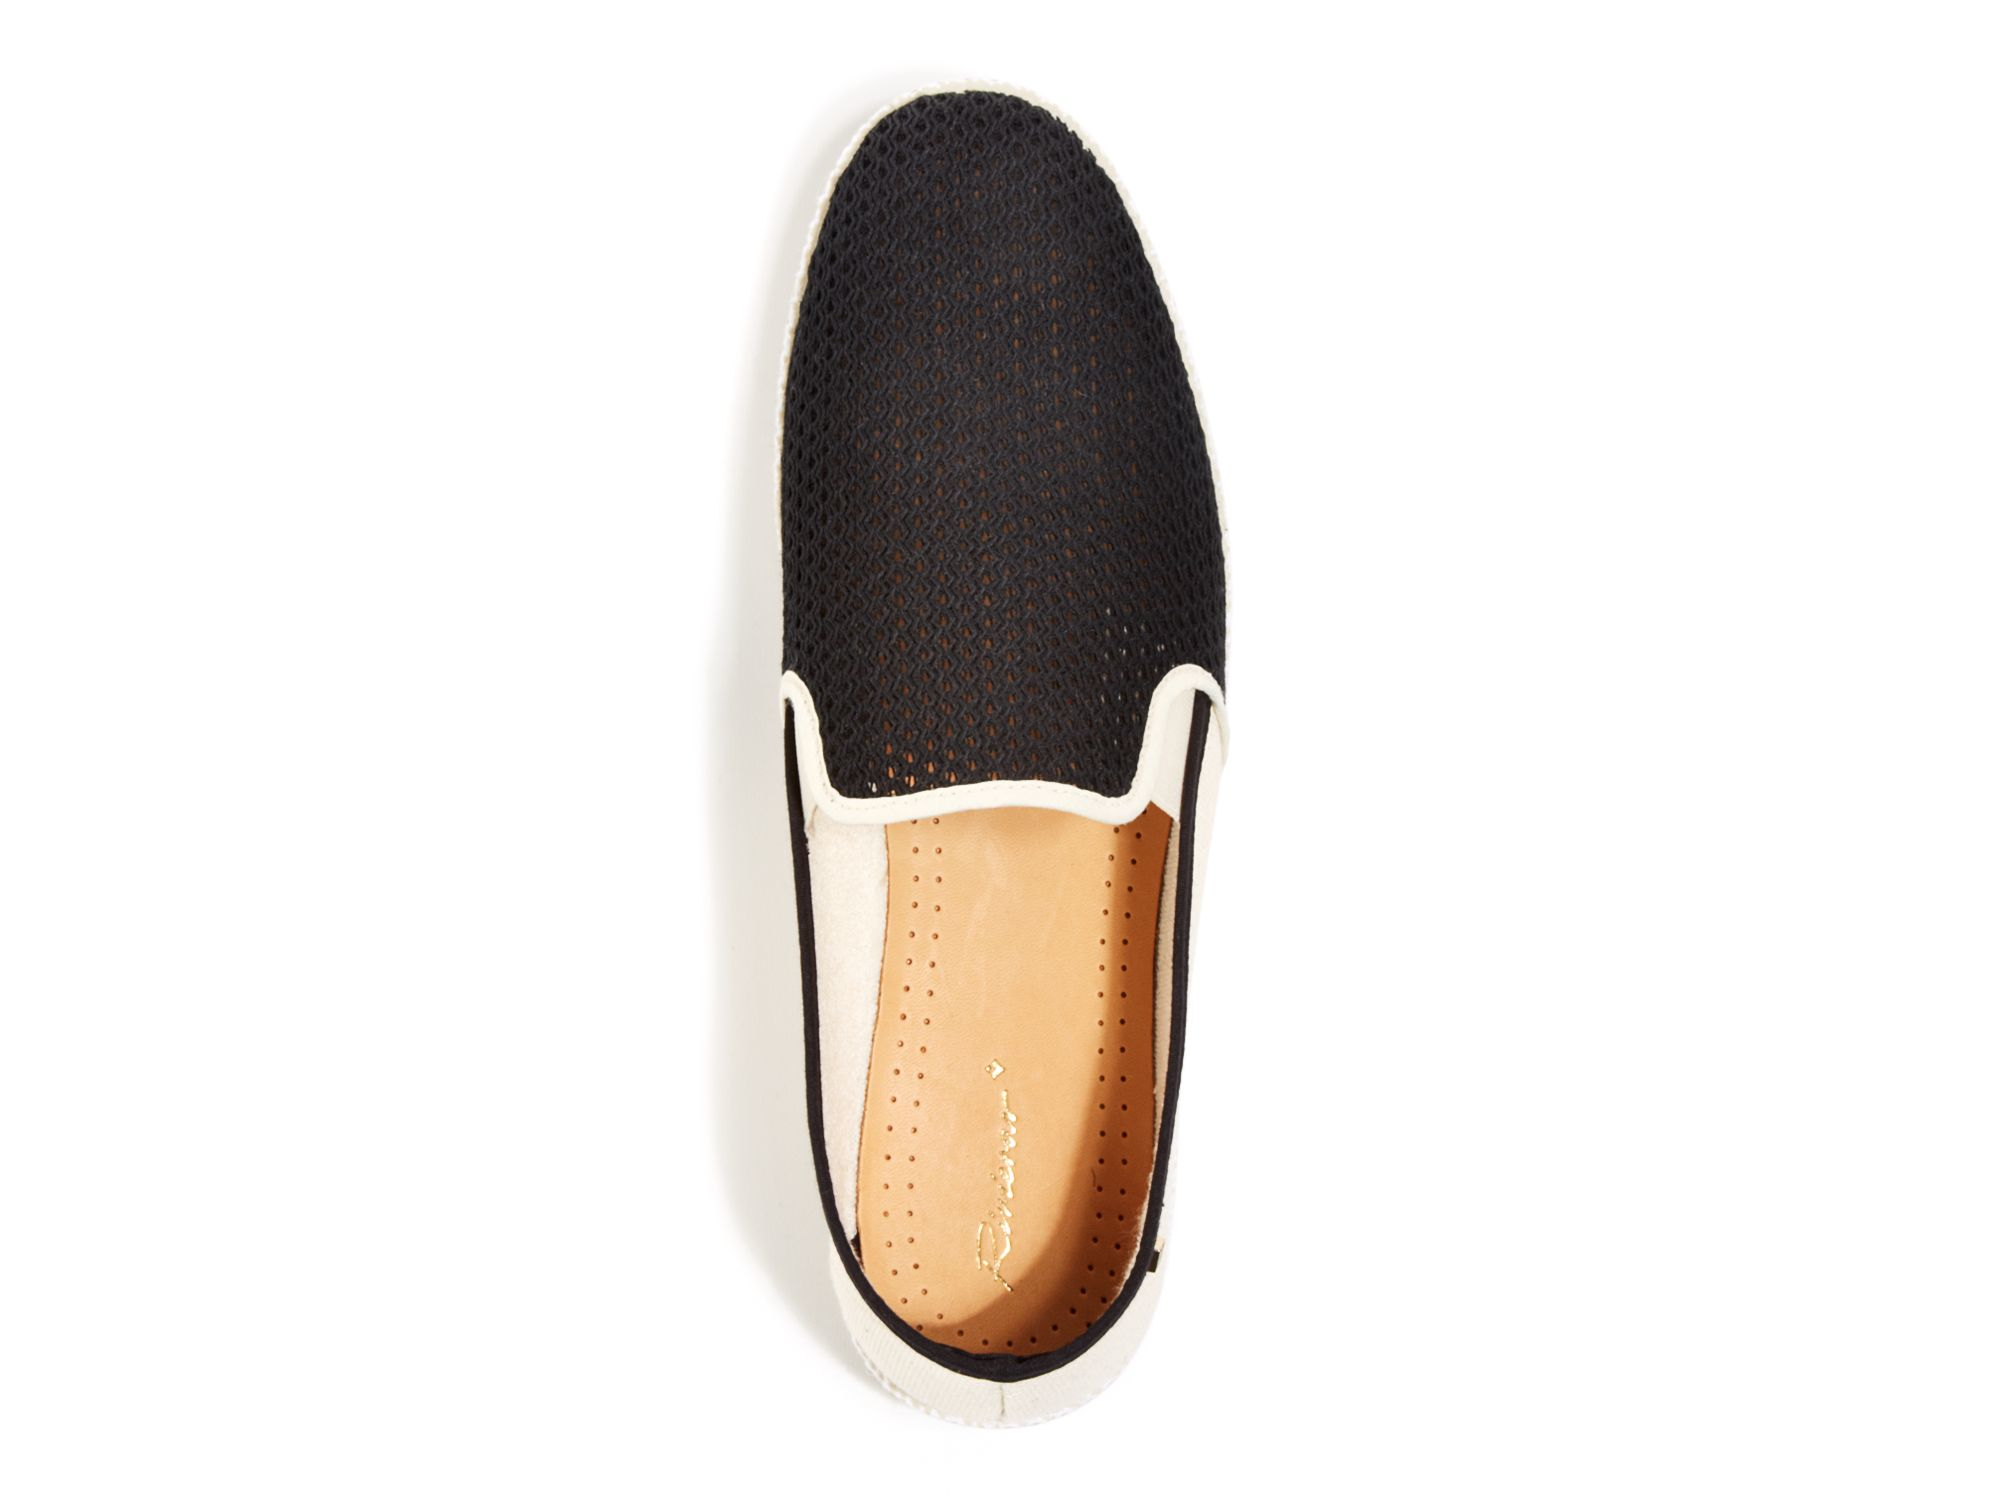 rivieras nervour wreck color block leisure shoes in black